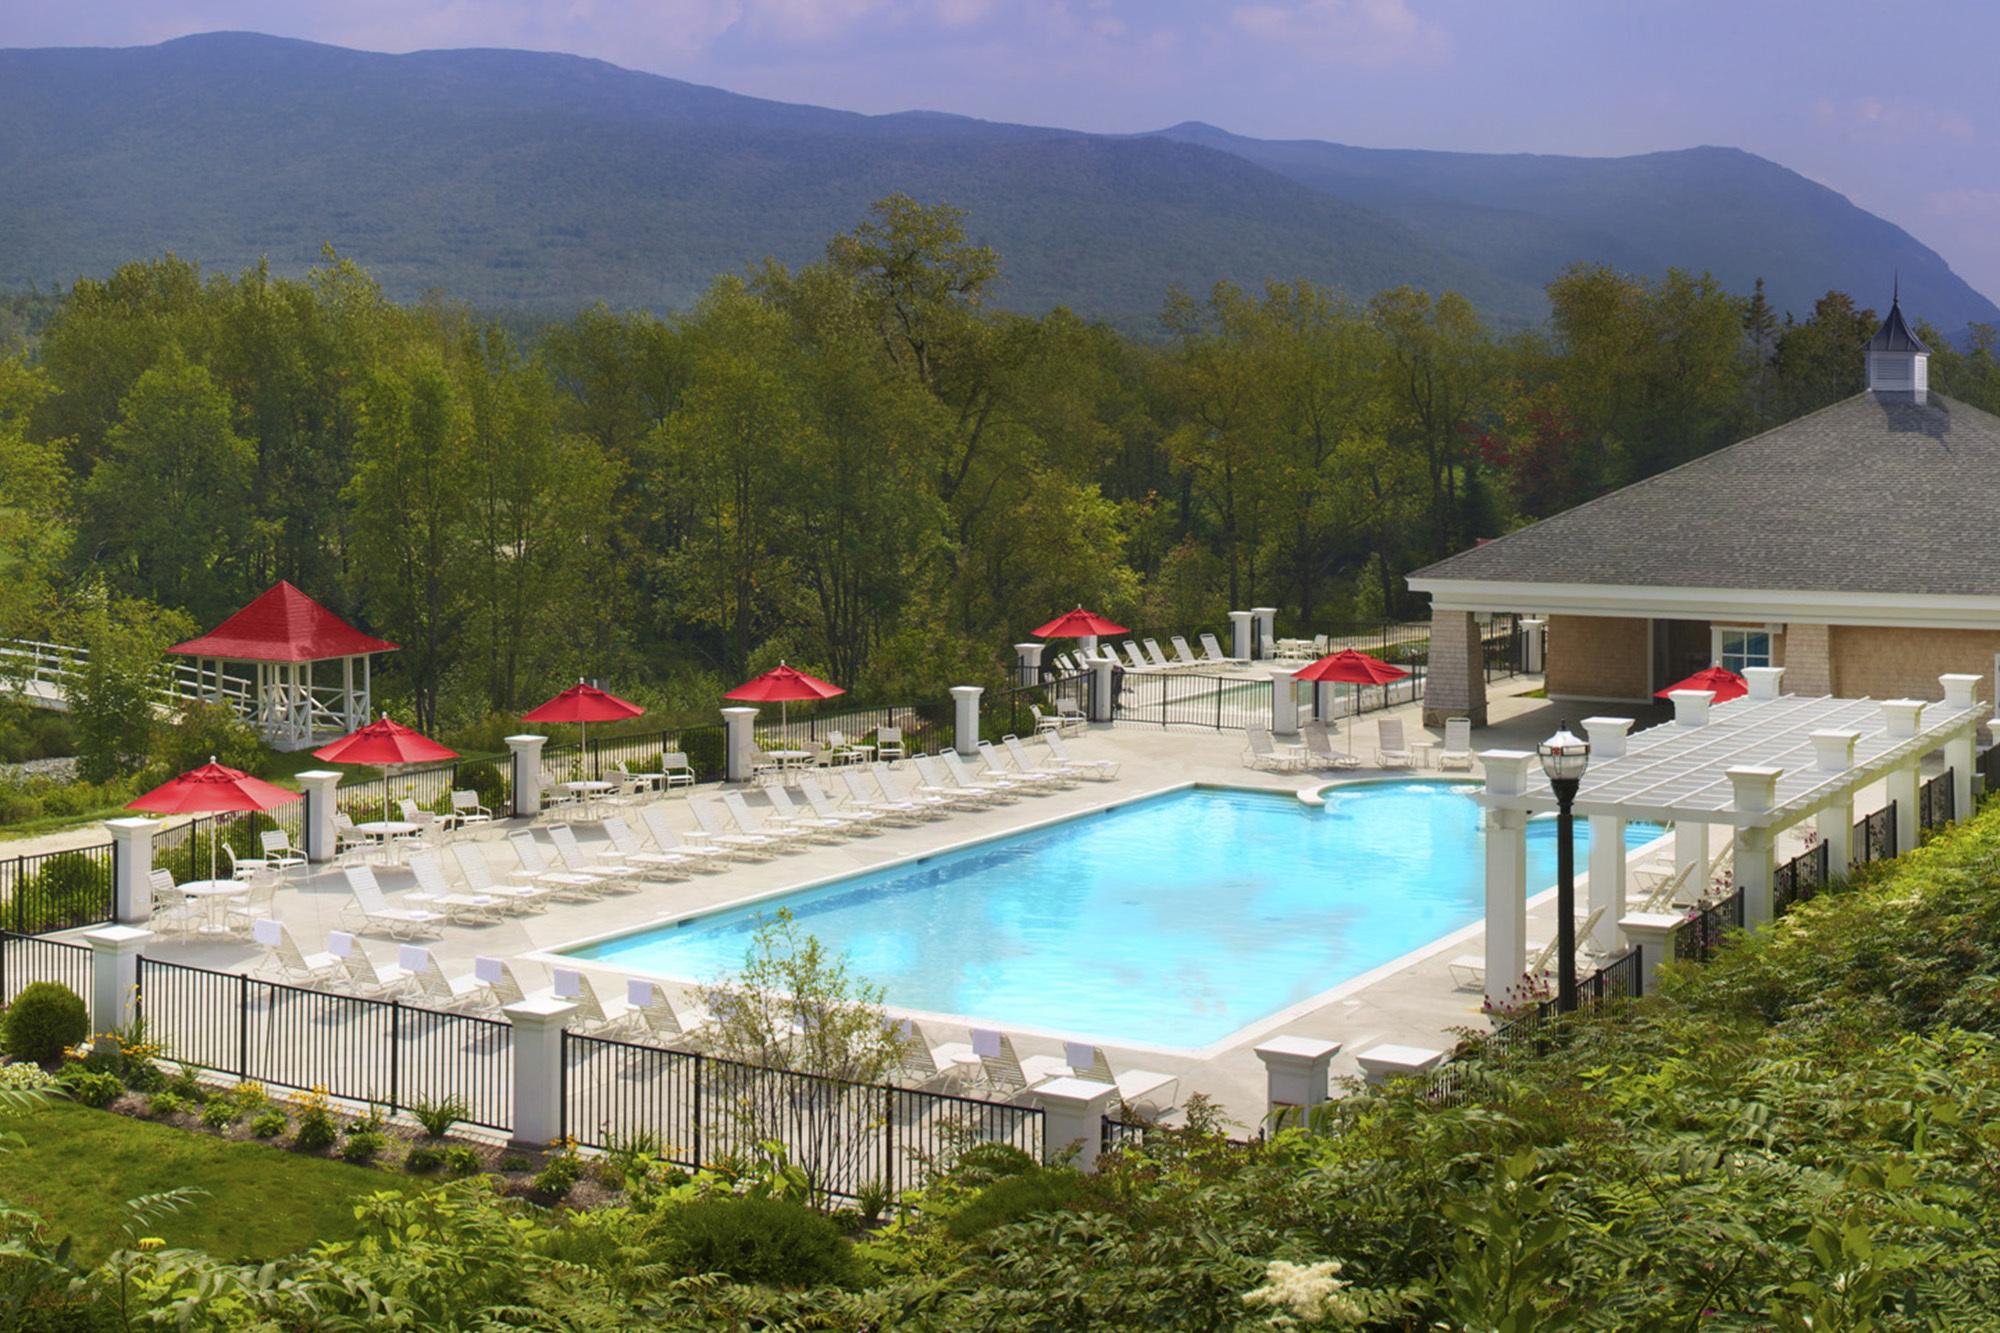 Omni Mt. Washington Resort, Bretton Woods, NH